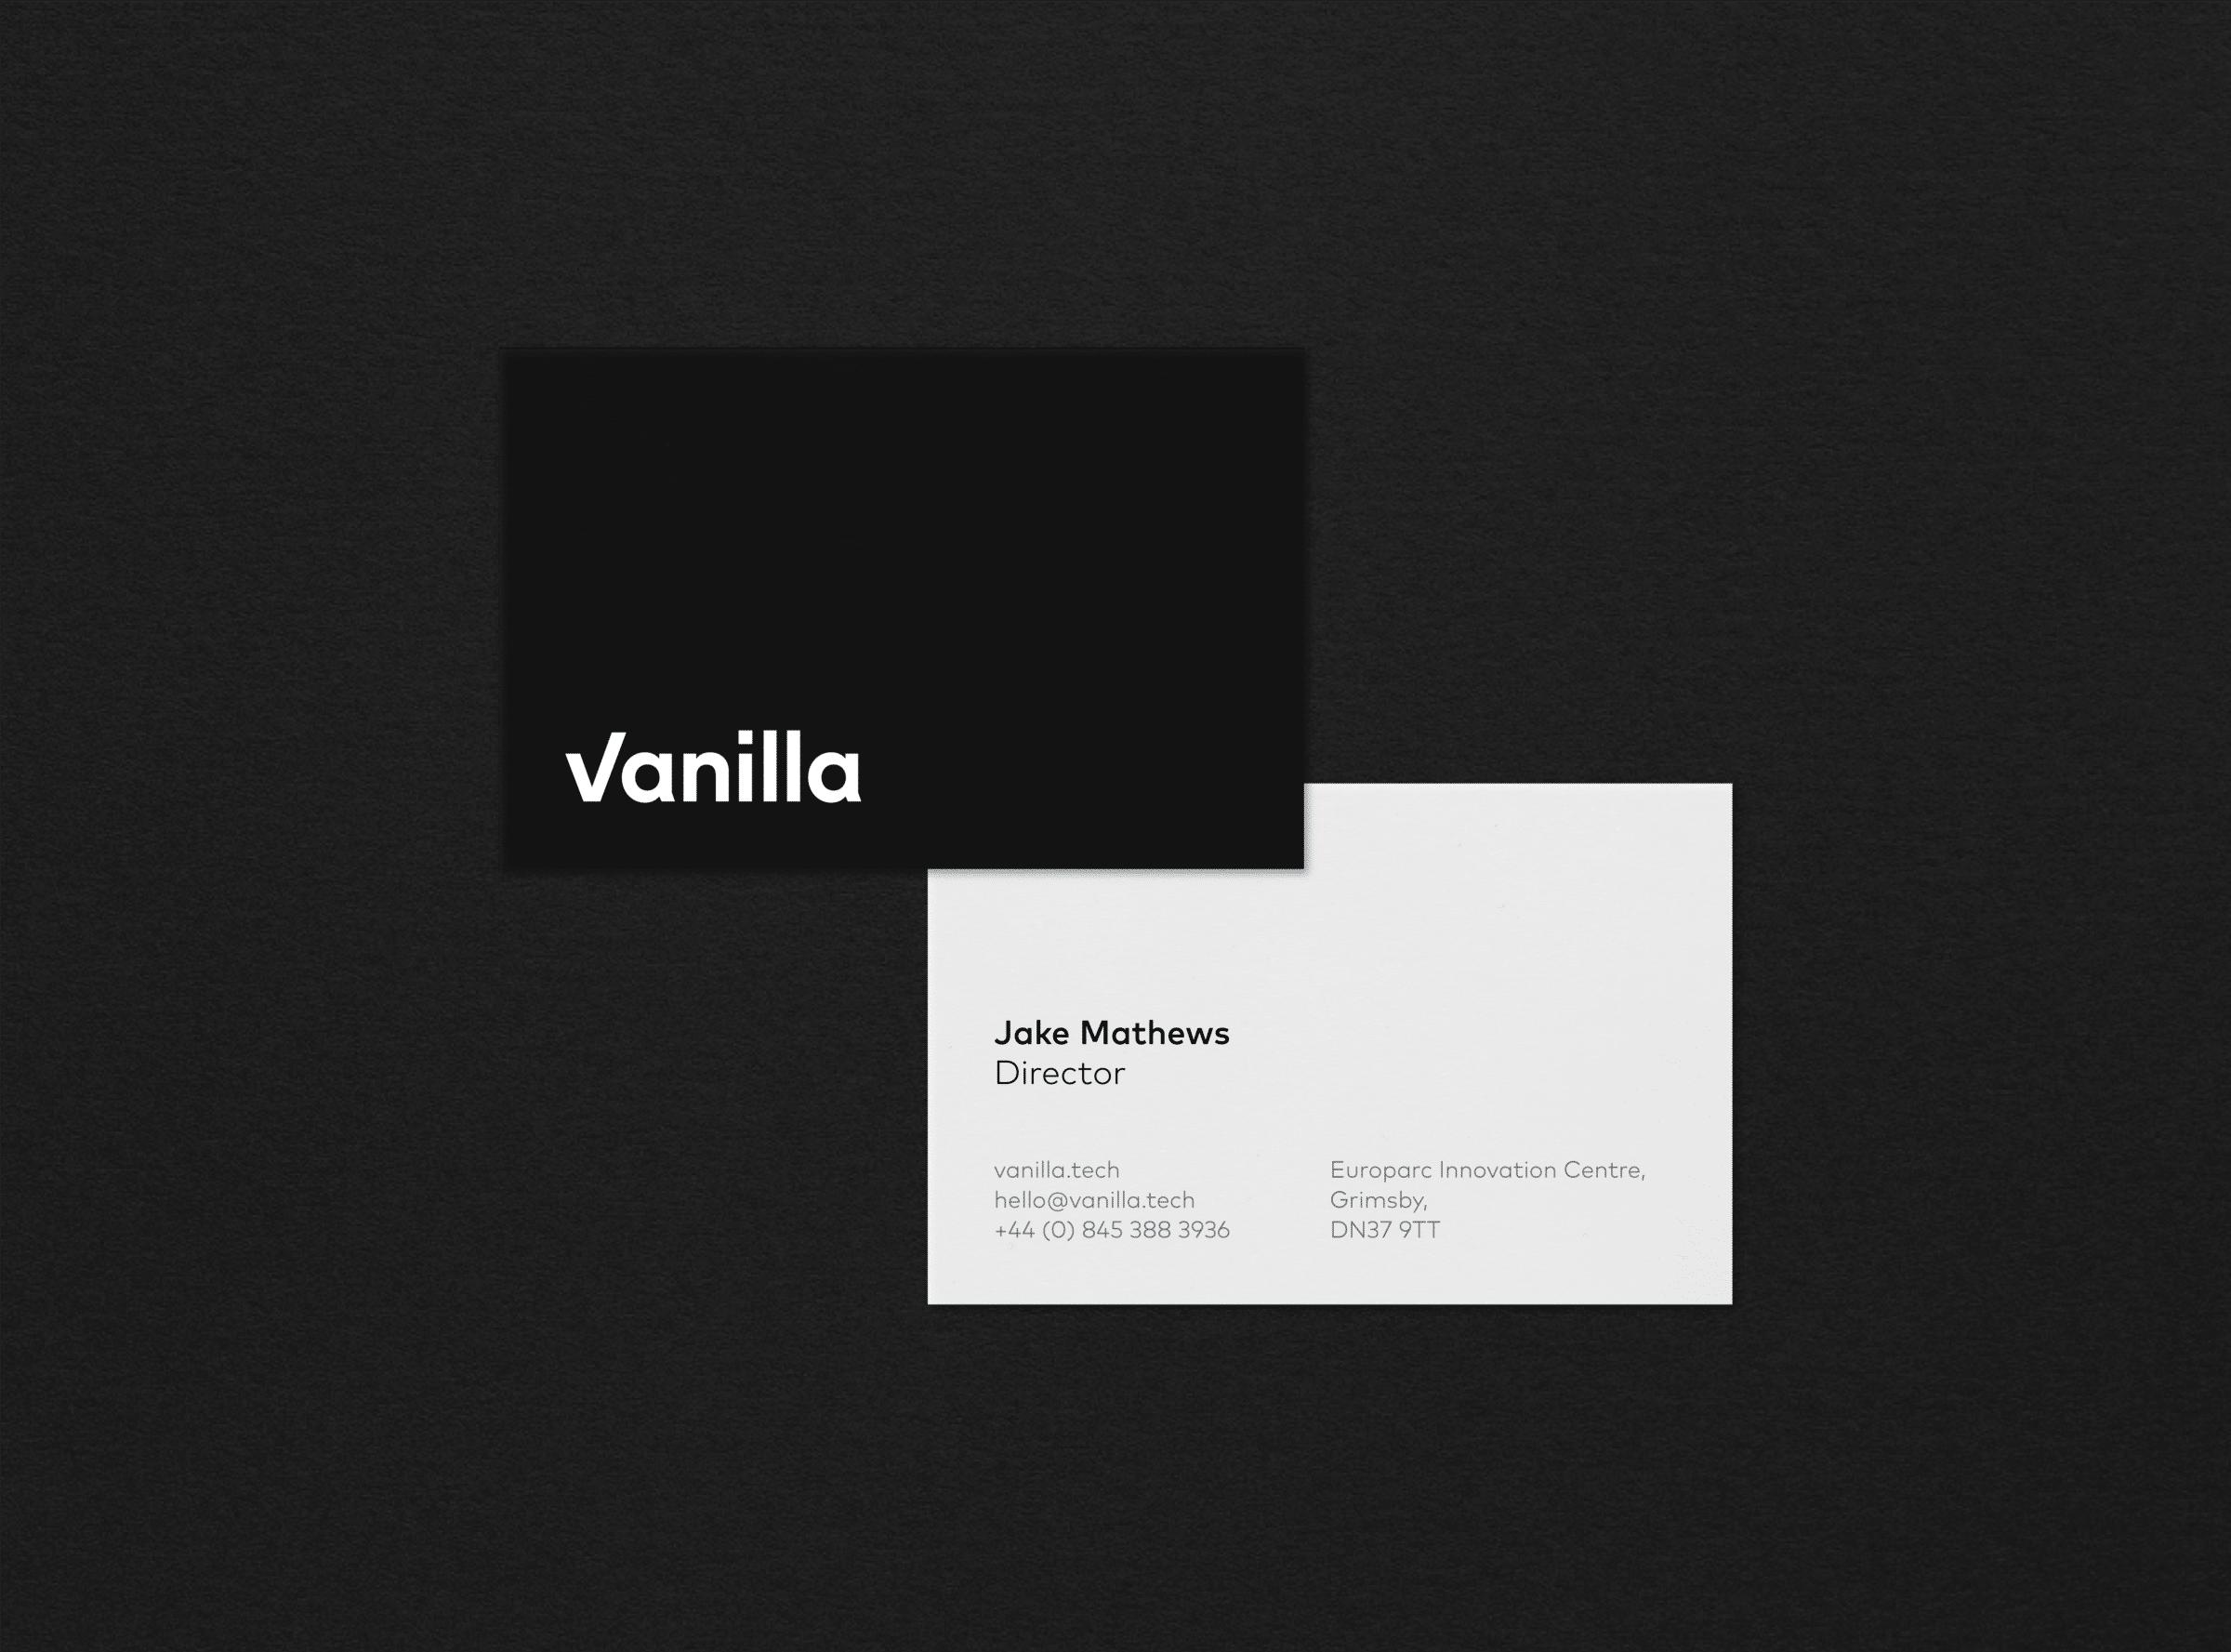 Business card design for Vanilla